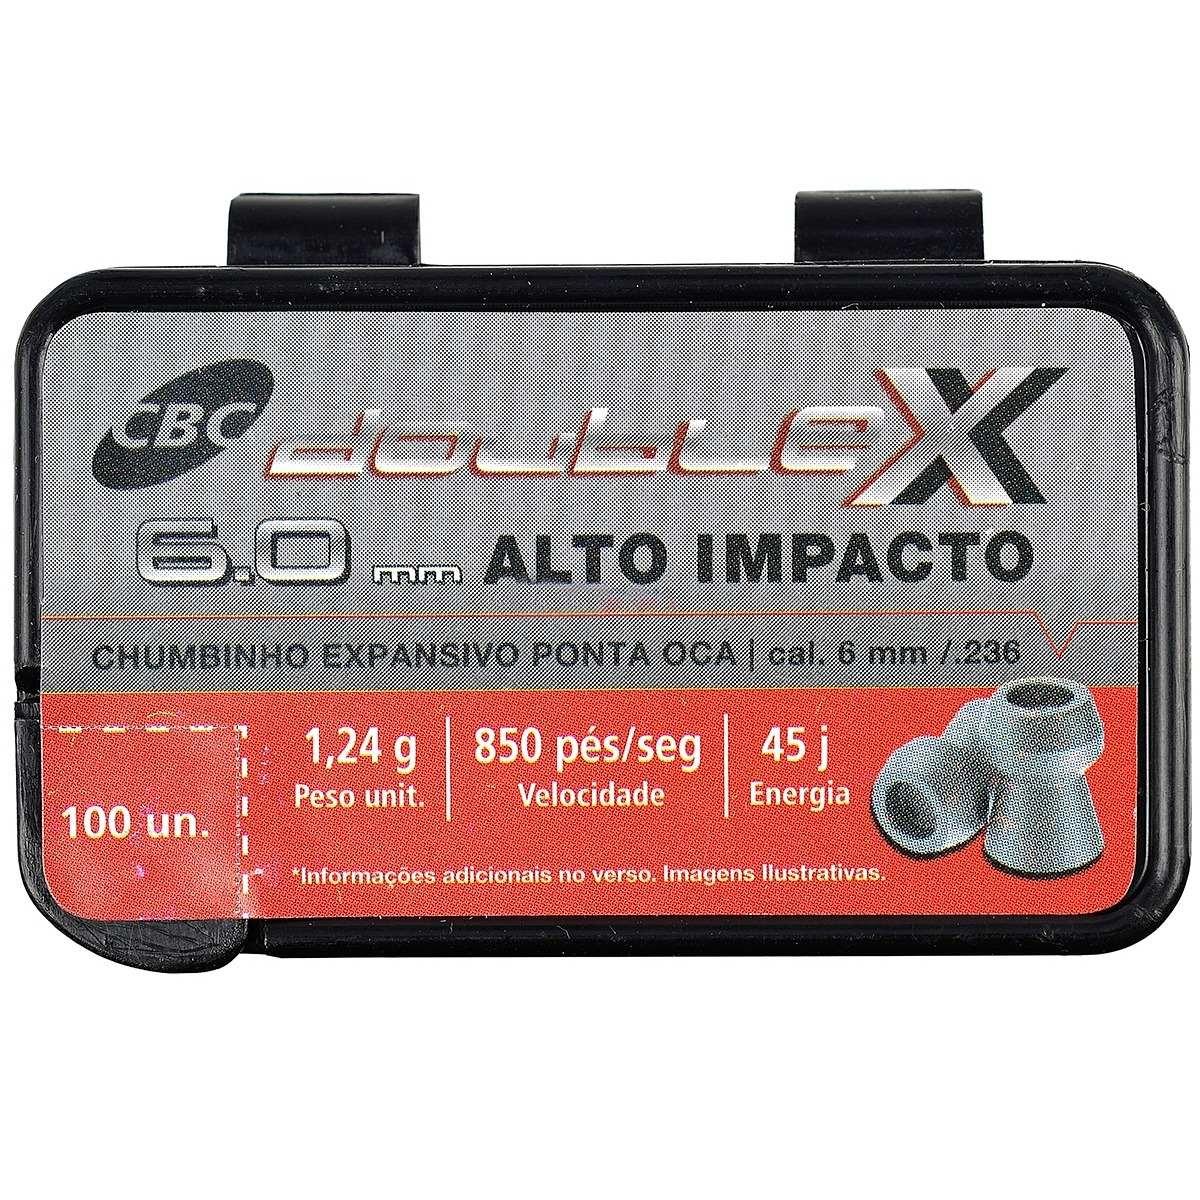 Chumbinho Double X de Alto Impacto 6,0 mm c/ 100 Unidades - CBC